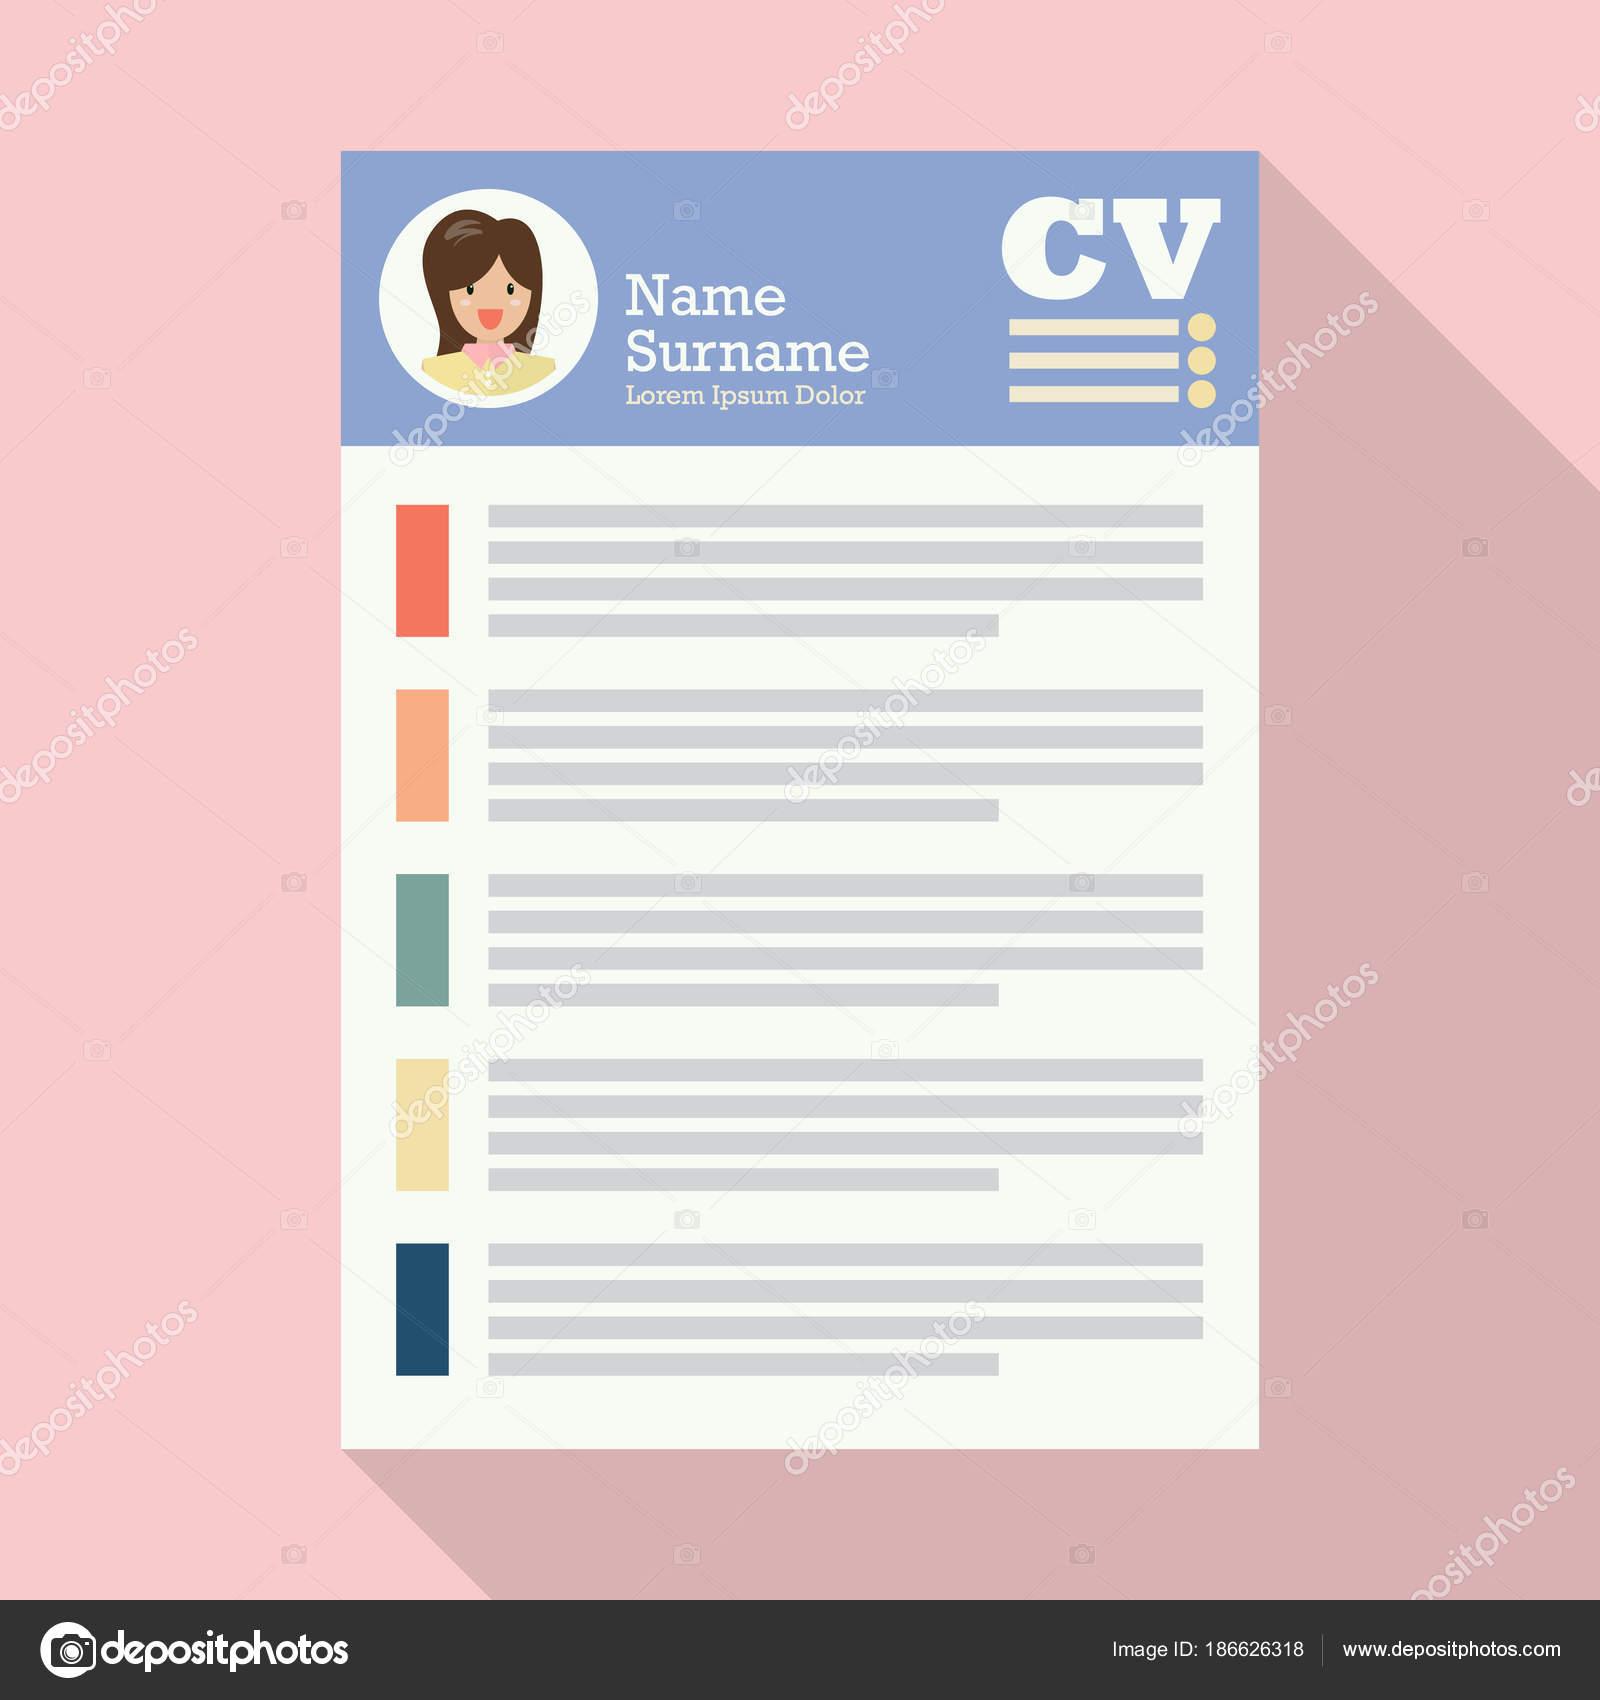 Curriculum Vitae u hoja de papel de uso de Cv — Vector de stock ...